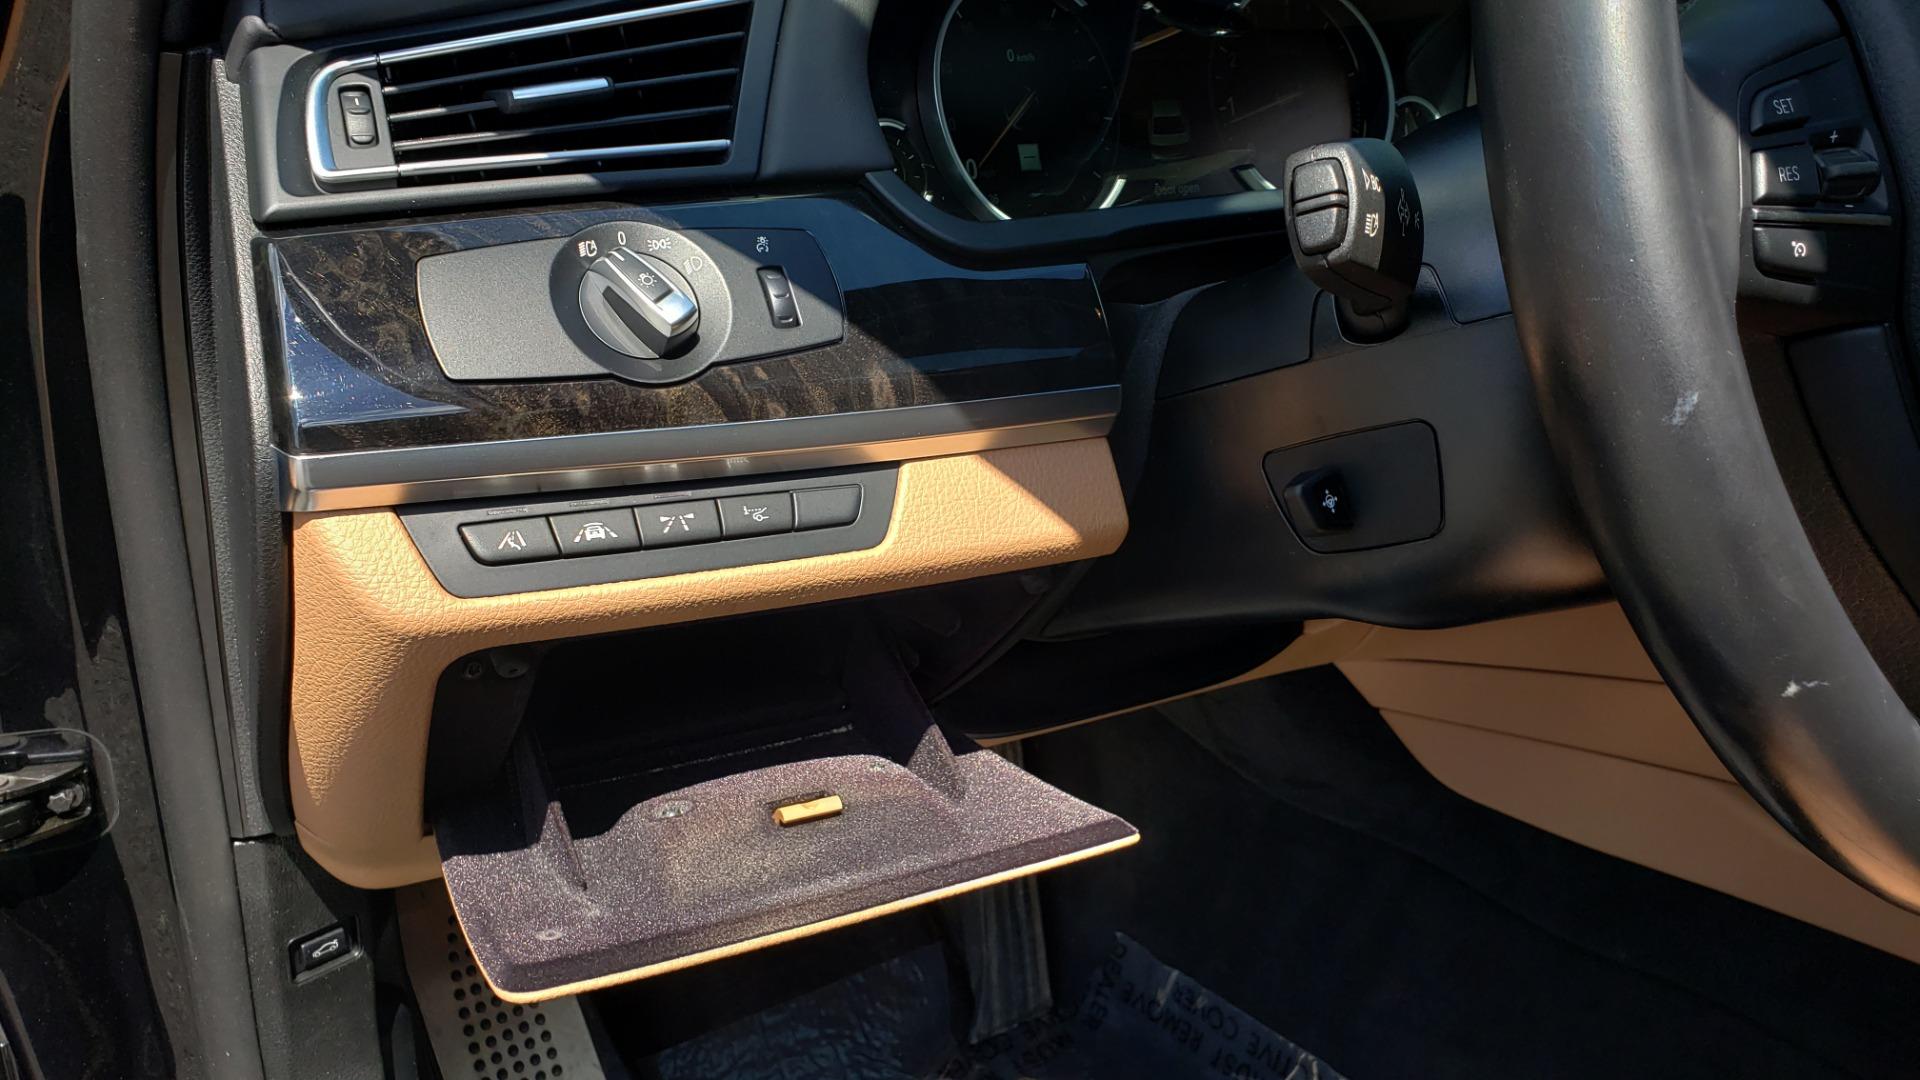 Used 2014 BMW 7 SERIES 750LI M-SPORT / EXEC PKG / DRVR ASST / LIGHTING / NAV / SUNROOF for sale Sold at Formula Imports in Charlotte NC 28227 33